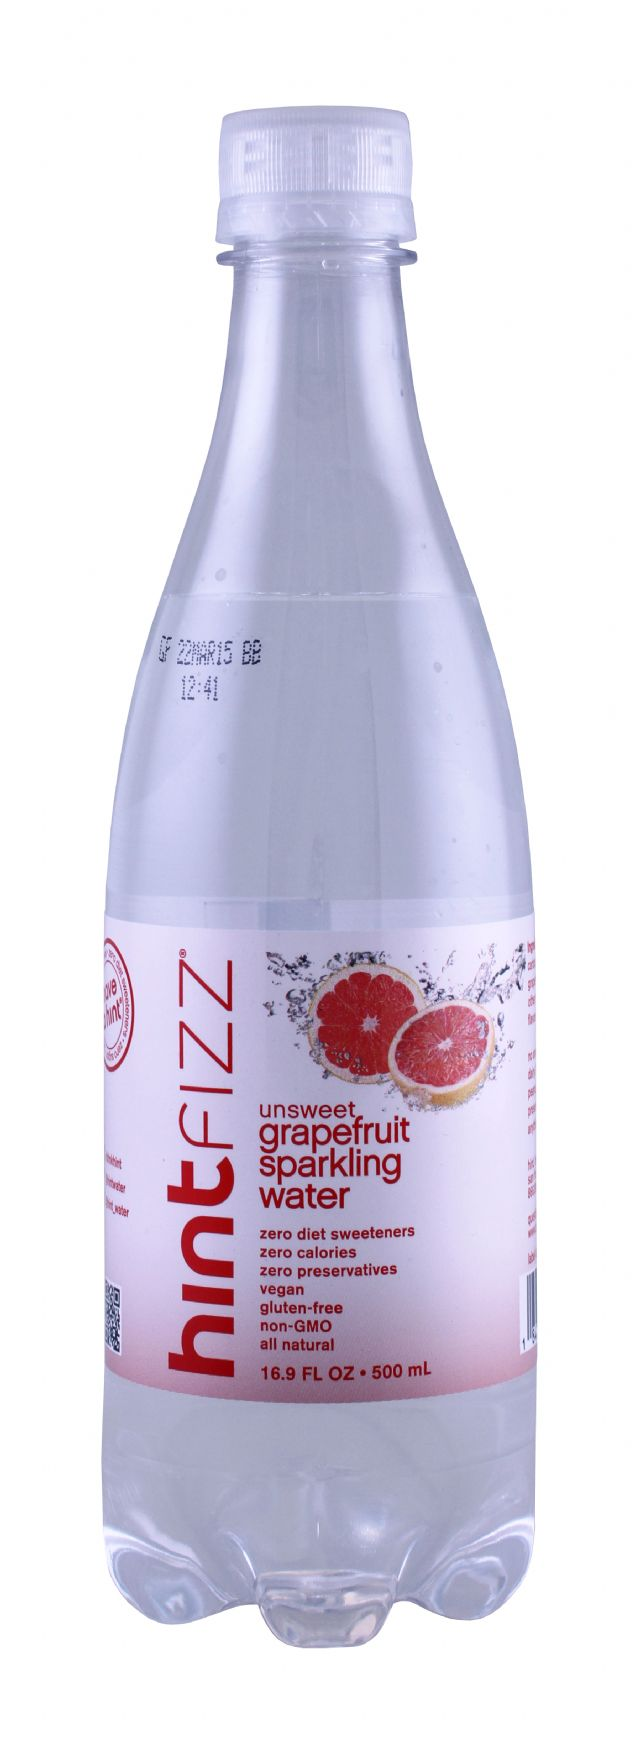 Hint Fizz: HintFizz_Grapefruit